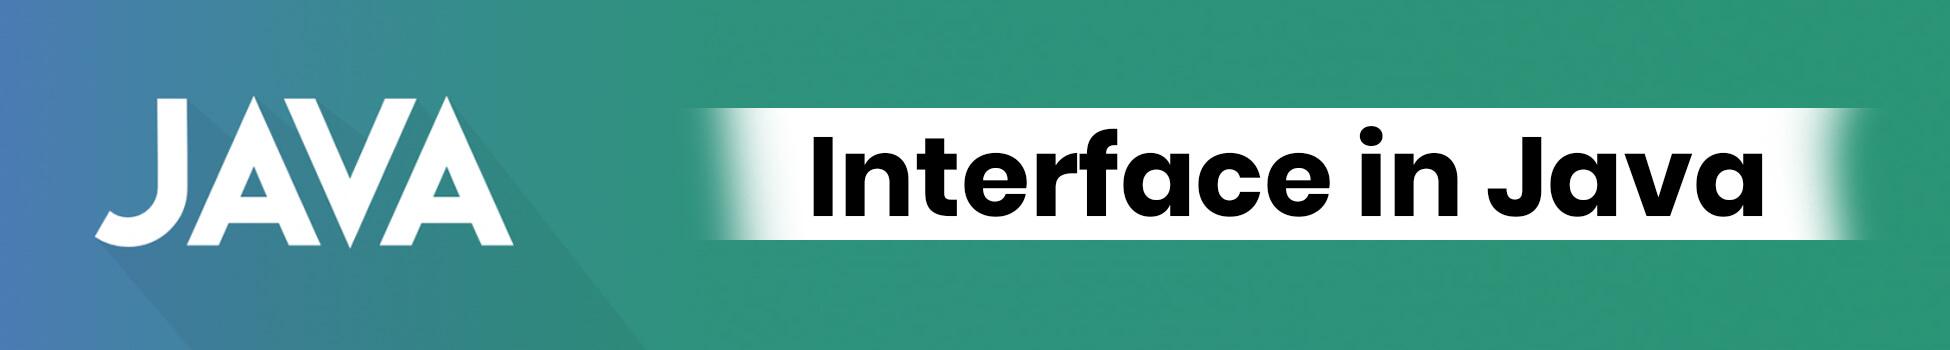 https://www.study24x7.com/article/377/interface-in-ja...